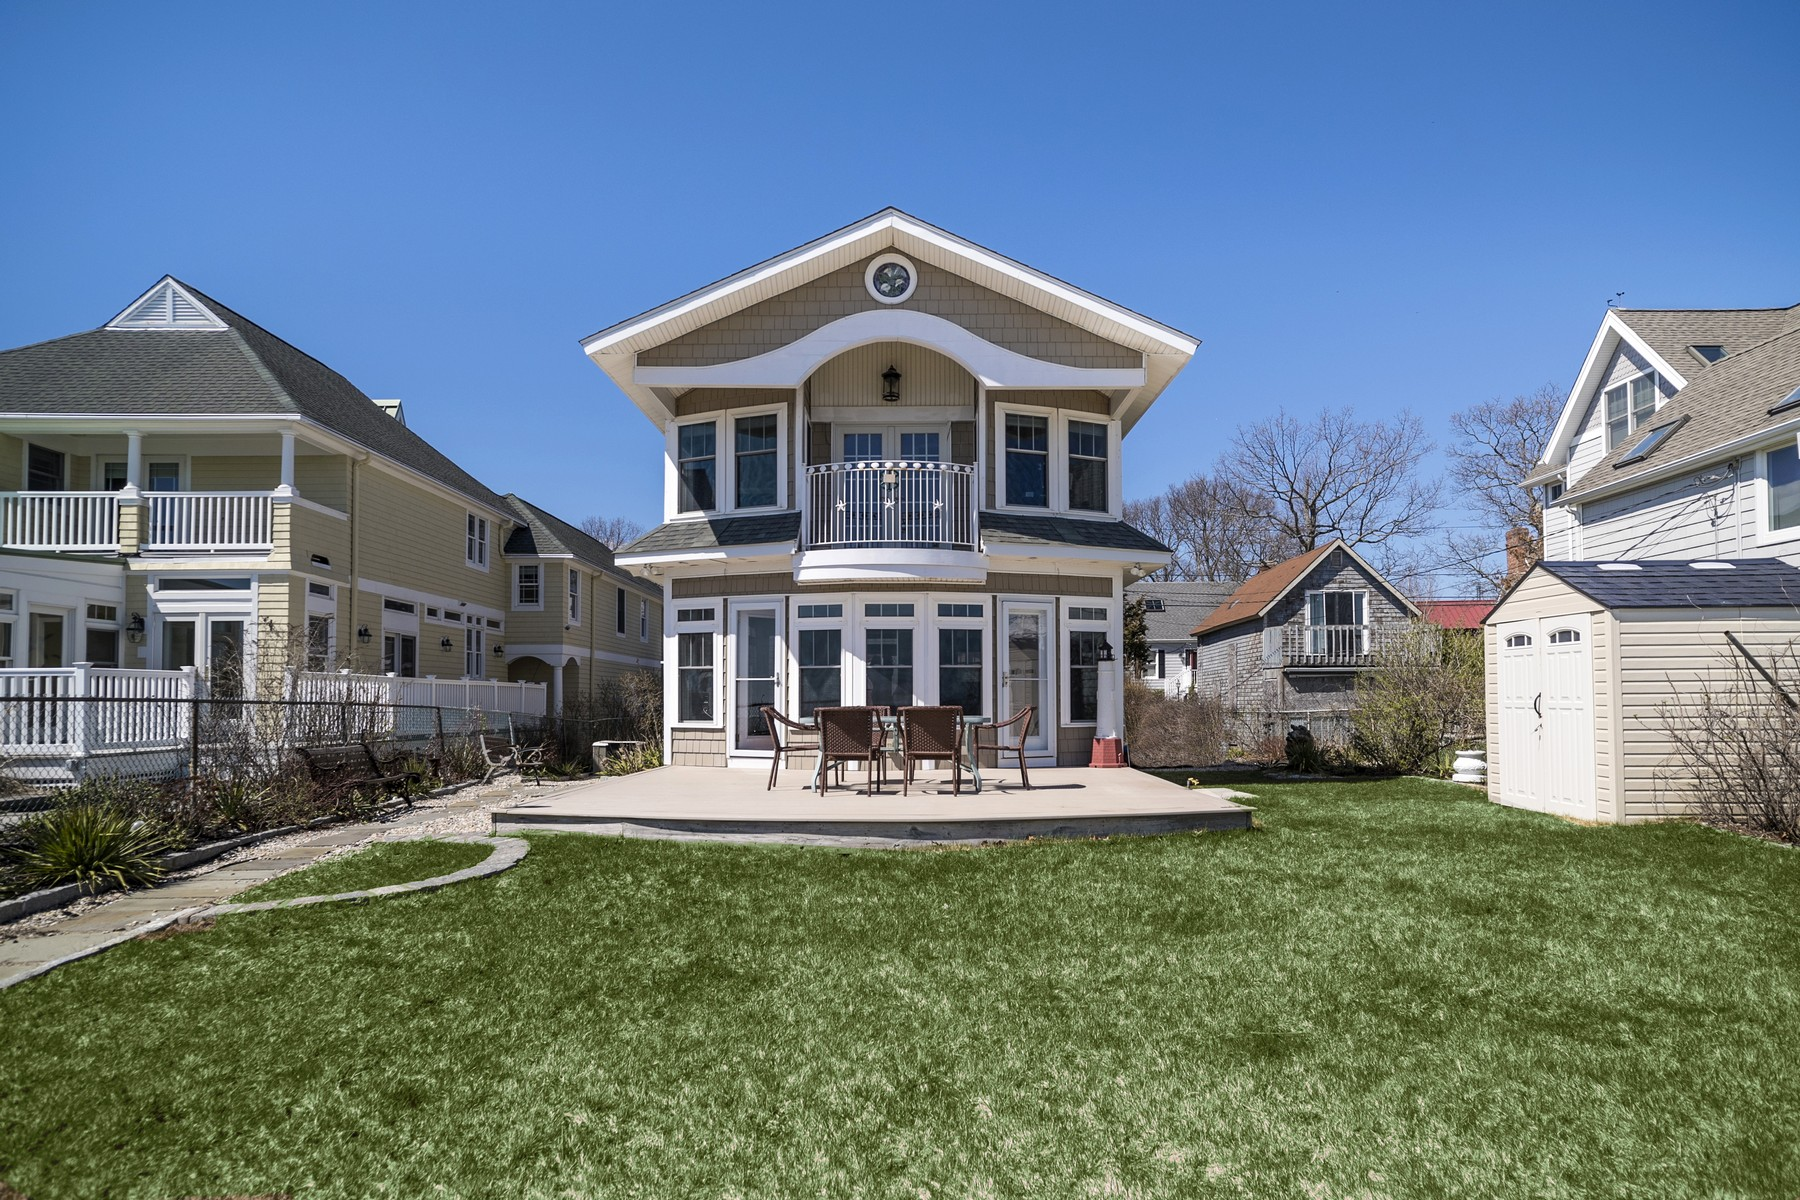 独户住宅 为 销售 在 Sun Filled Waterfront Home 159 Shore Road 克林顿, 康涅狄格州, 06413 美国